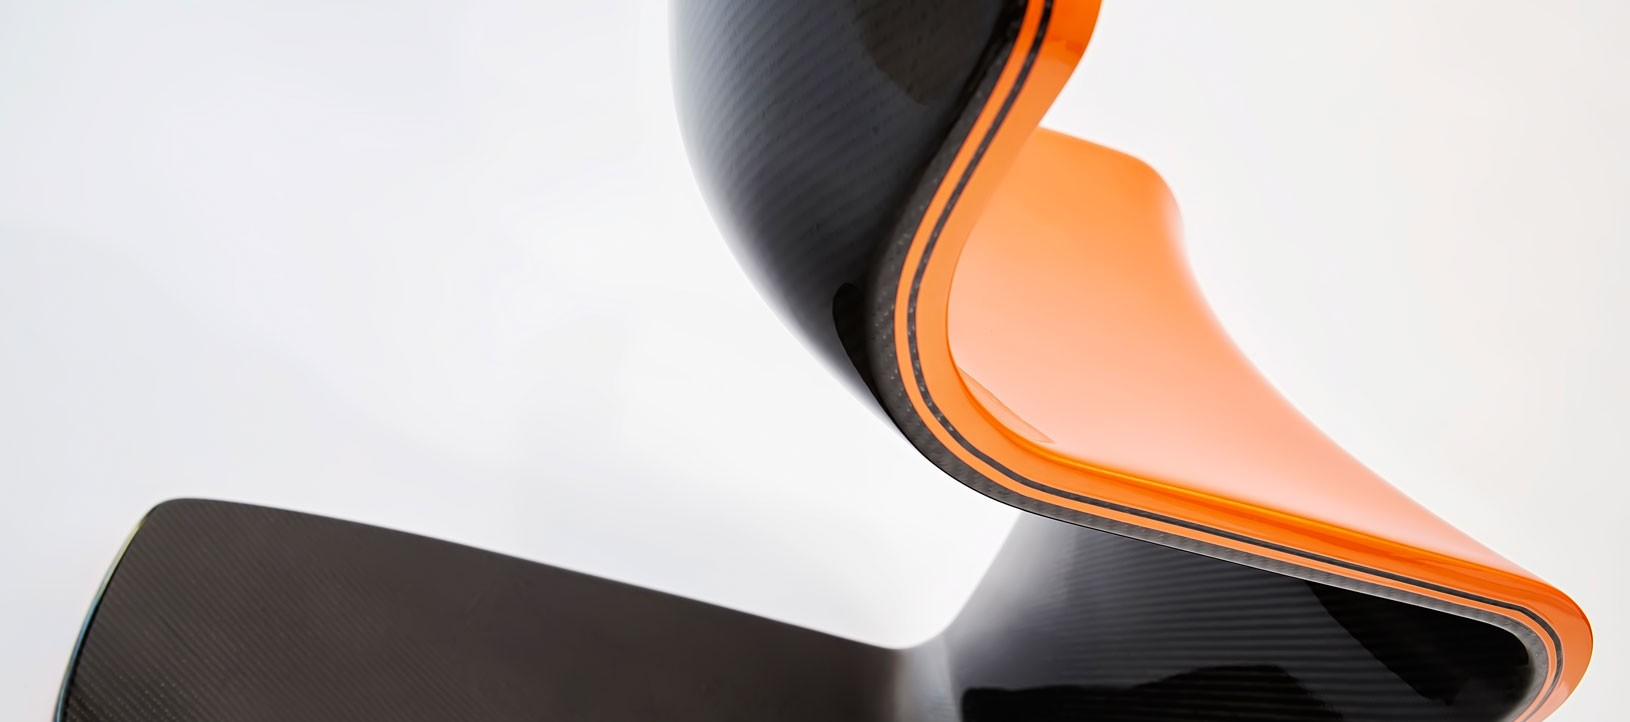 f1-carbon-fiber-lounge-chair-orange-9